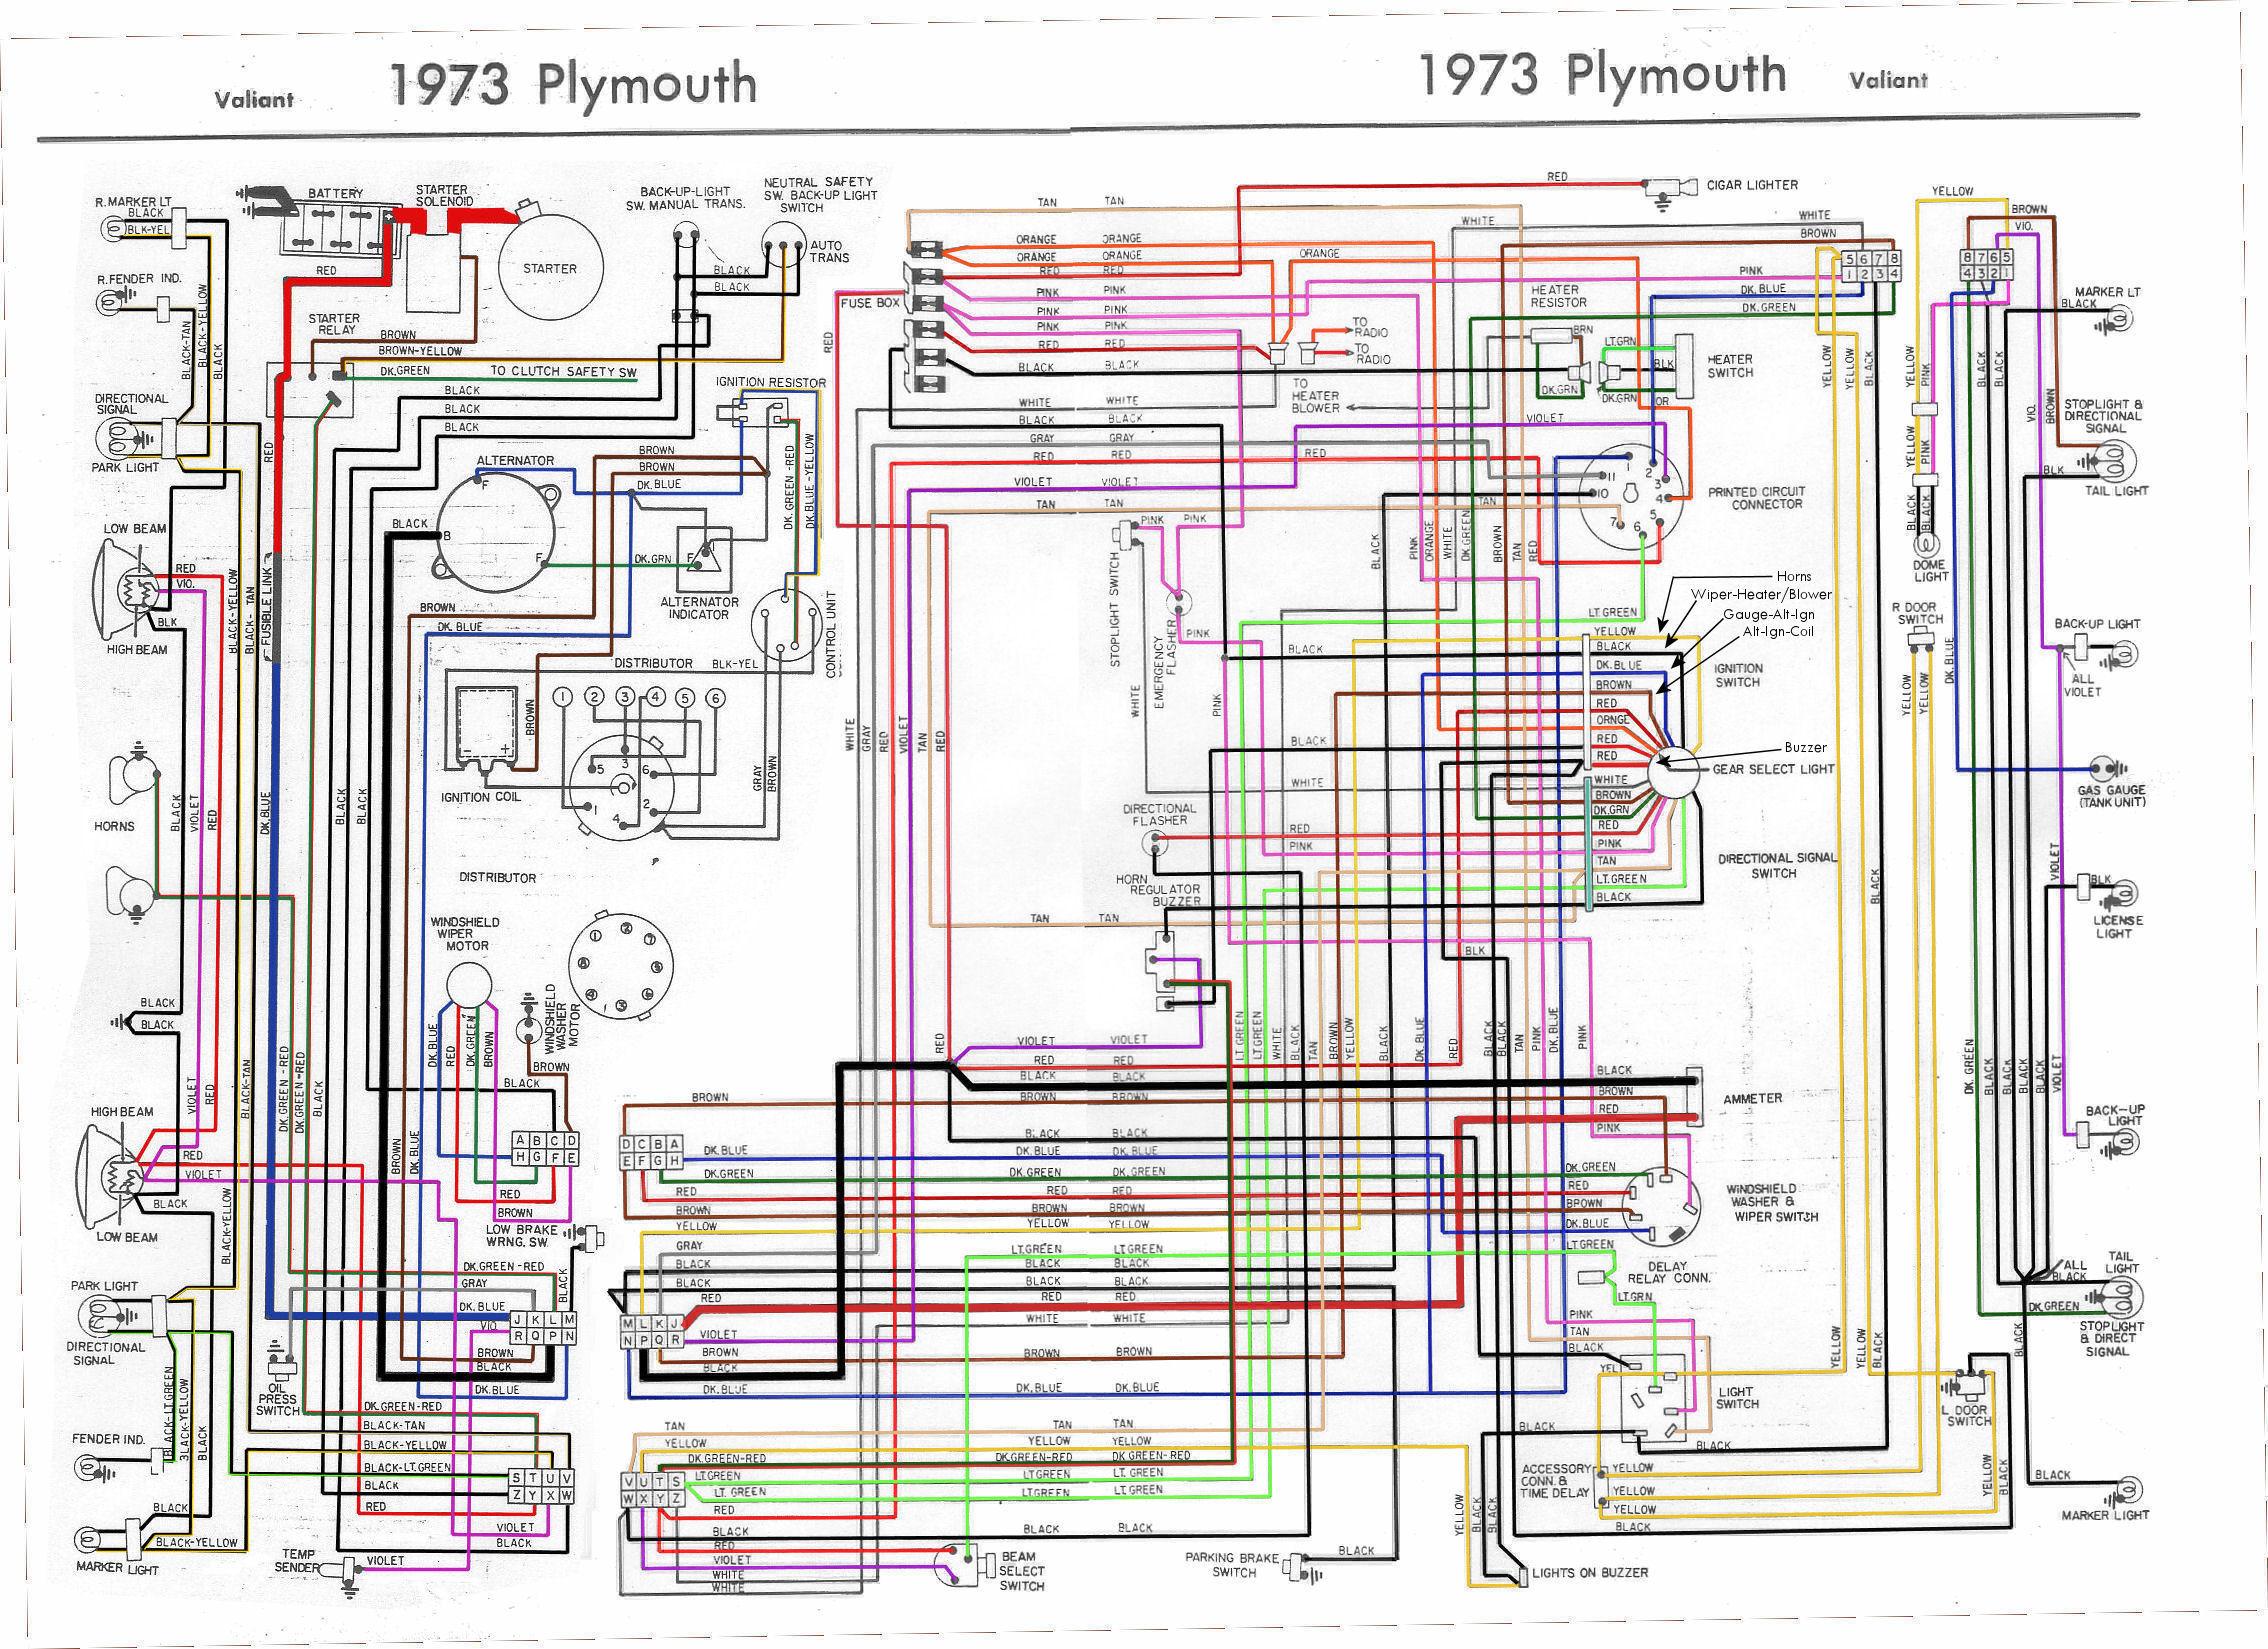 Awesome Wrg 0721 1969 Plymouth Road Runner Dash Wiring Diagram Wiring Cloud Mousmenurrecoveryedborg